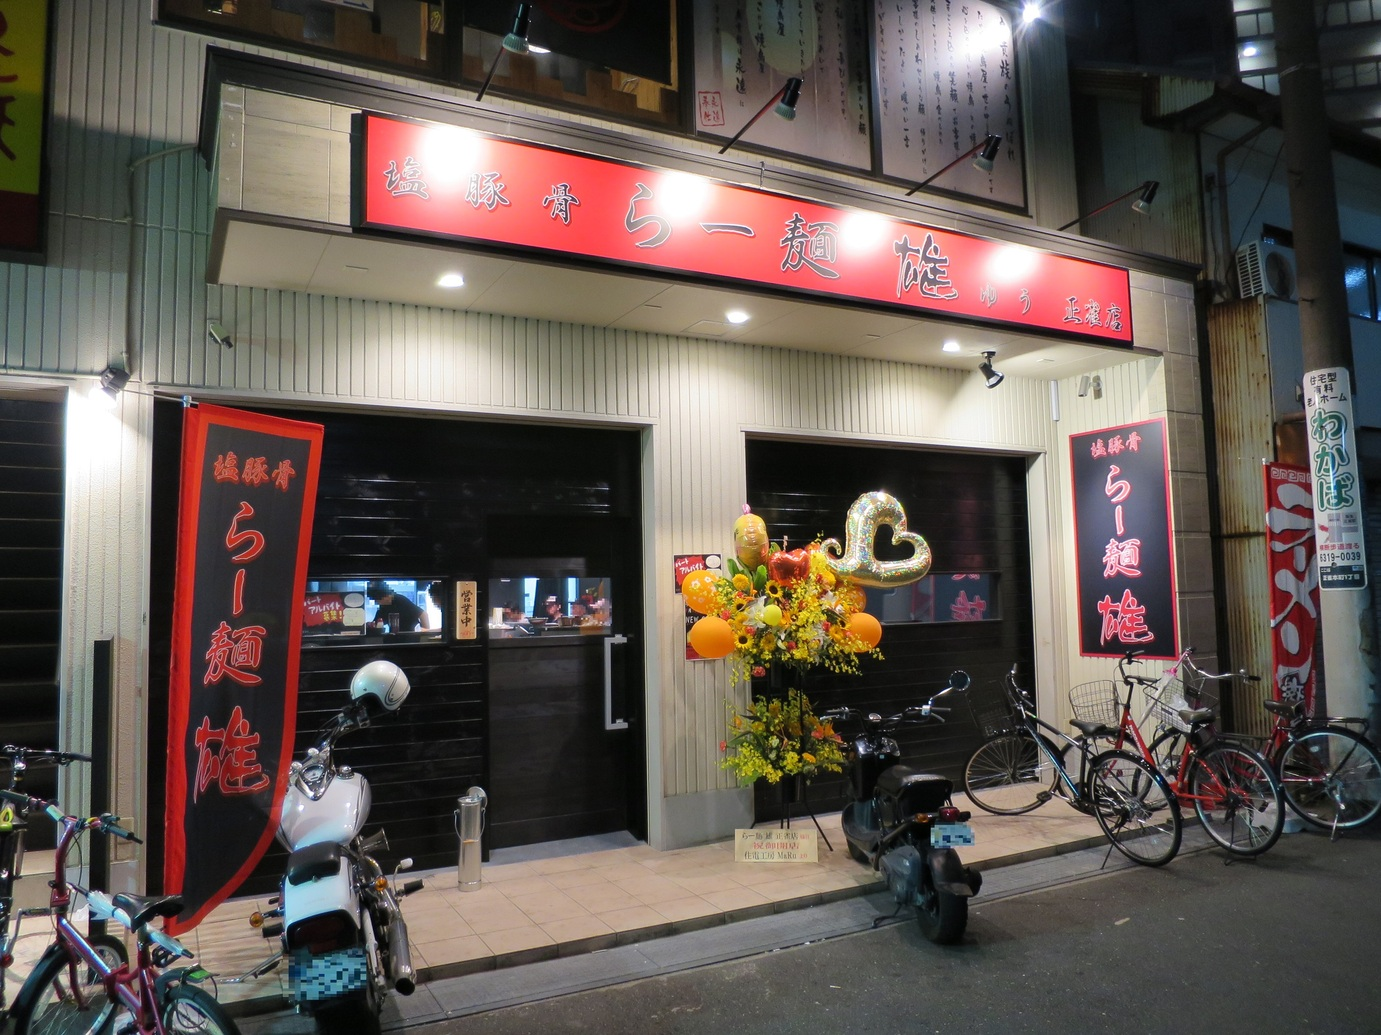 塩豚骨 らー麺 雄 正雀店